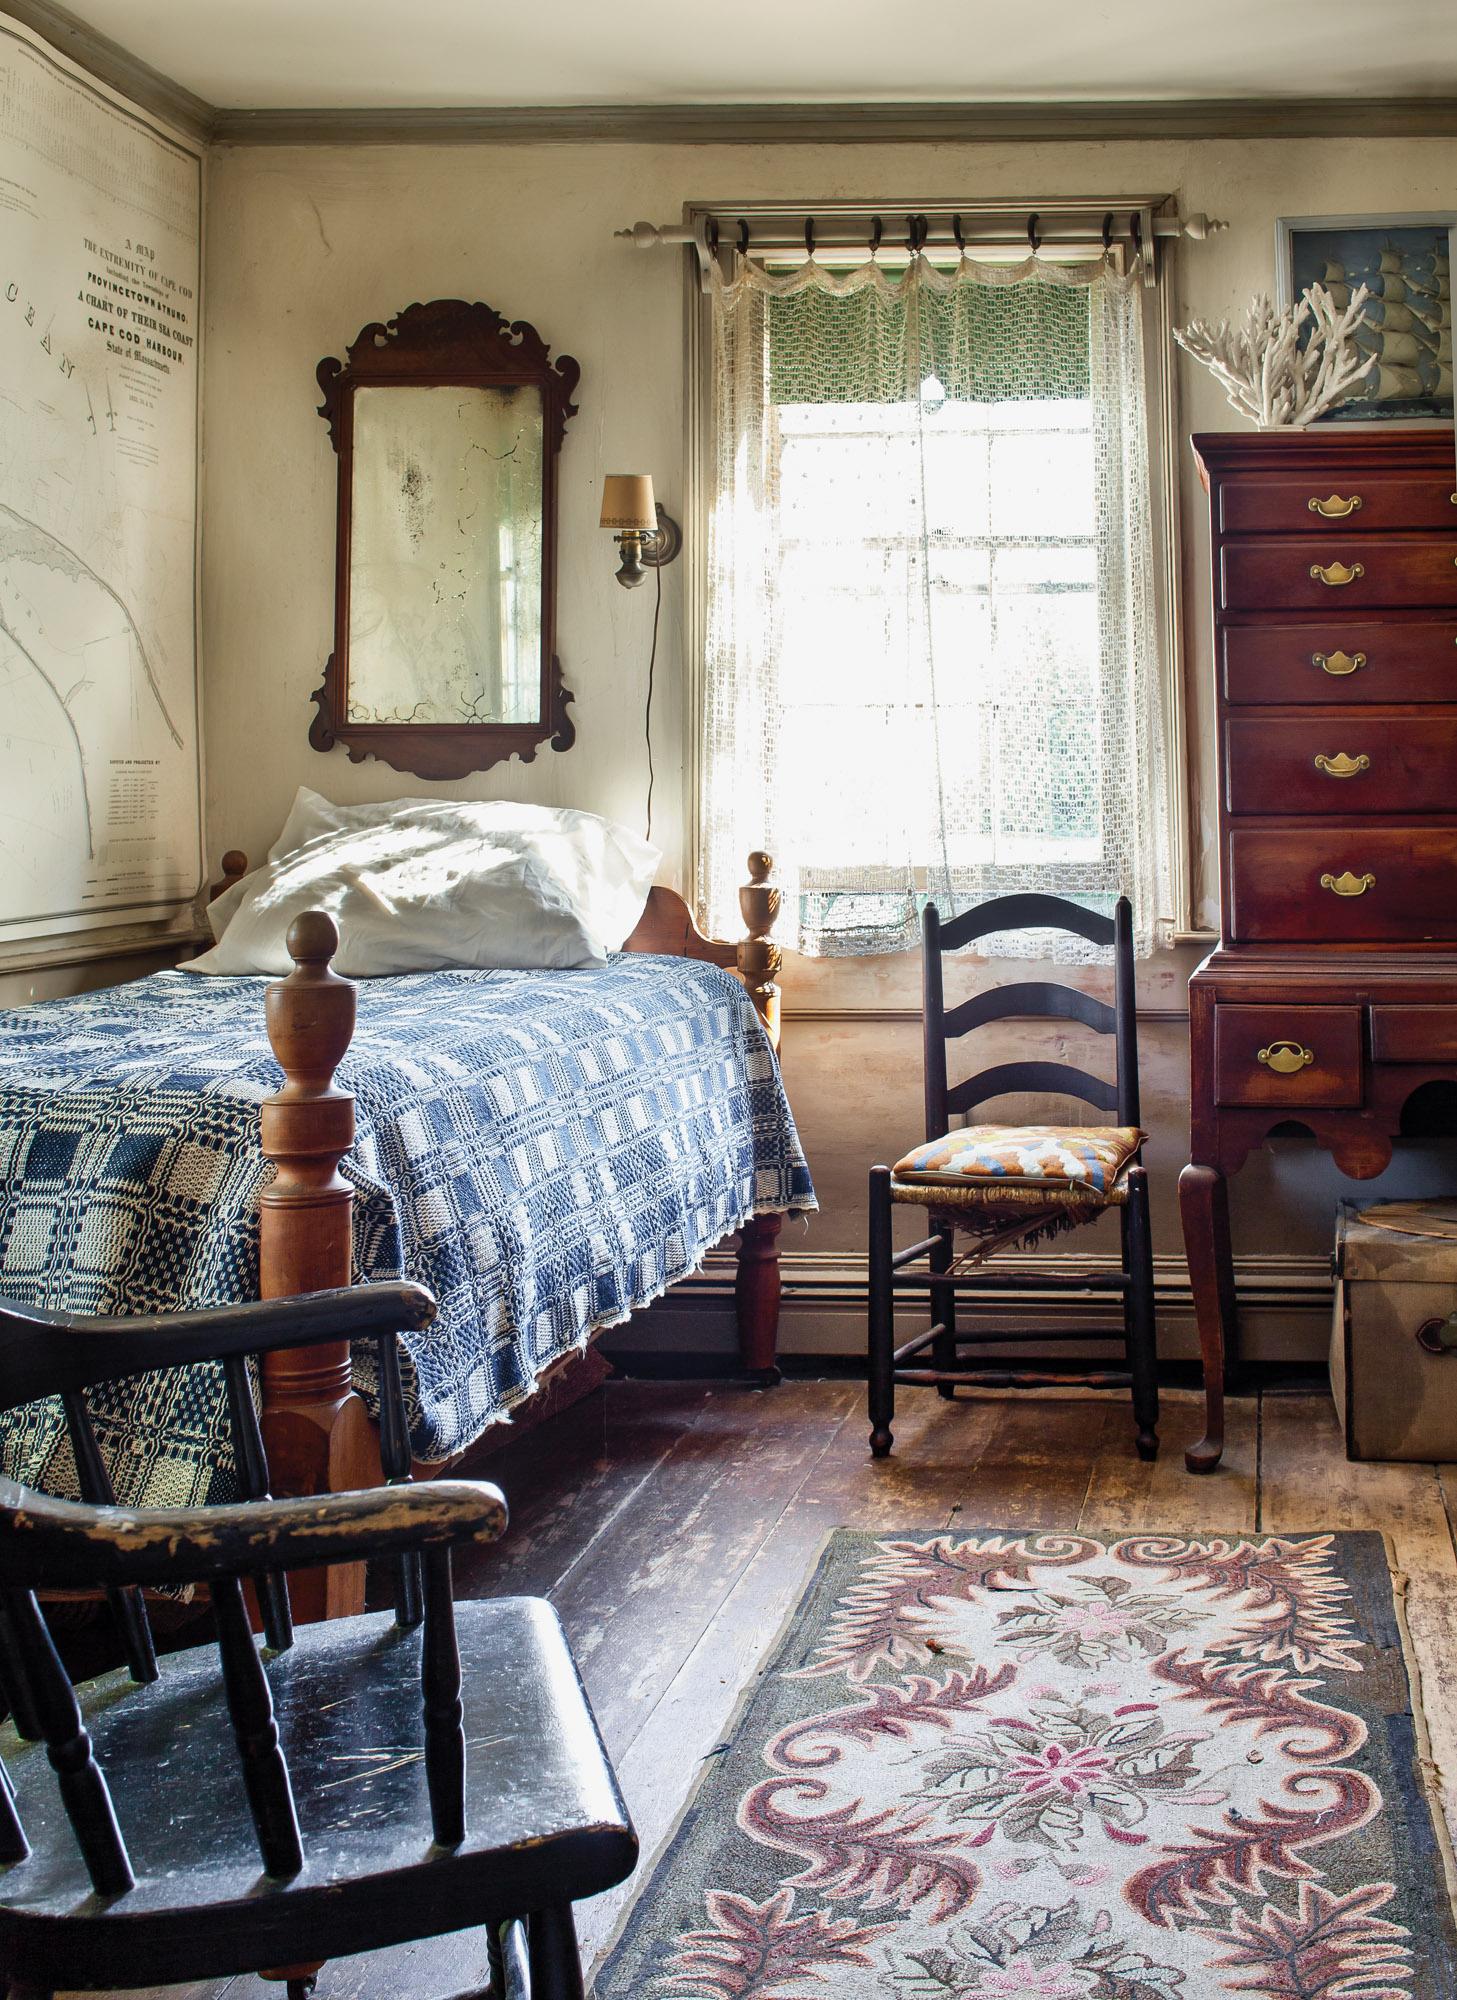 hooked rug, homespun coverlet